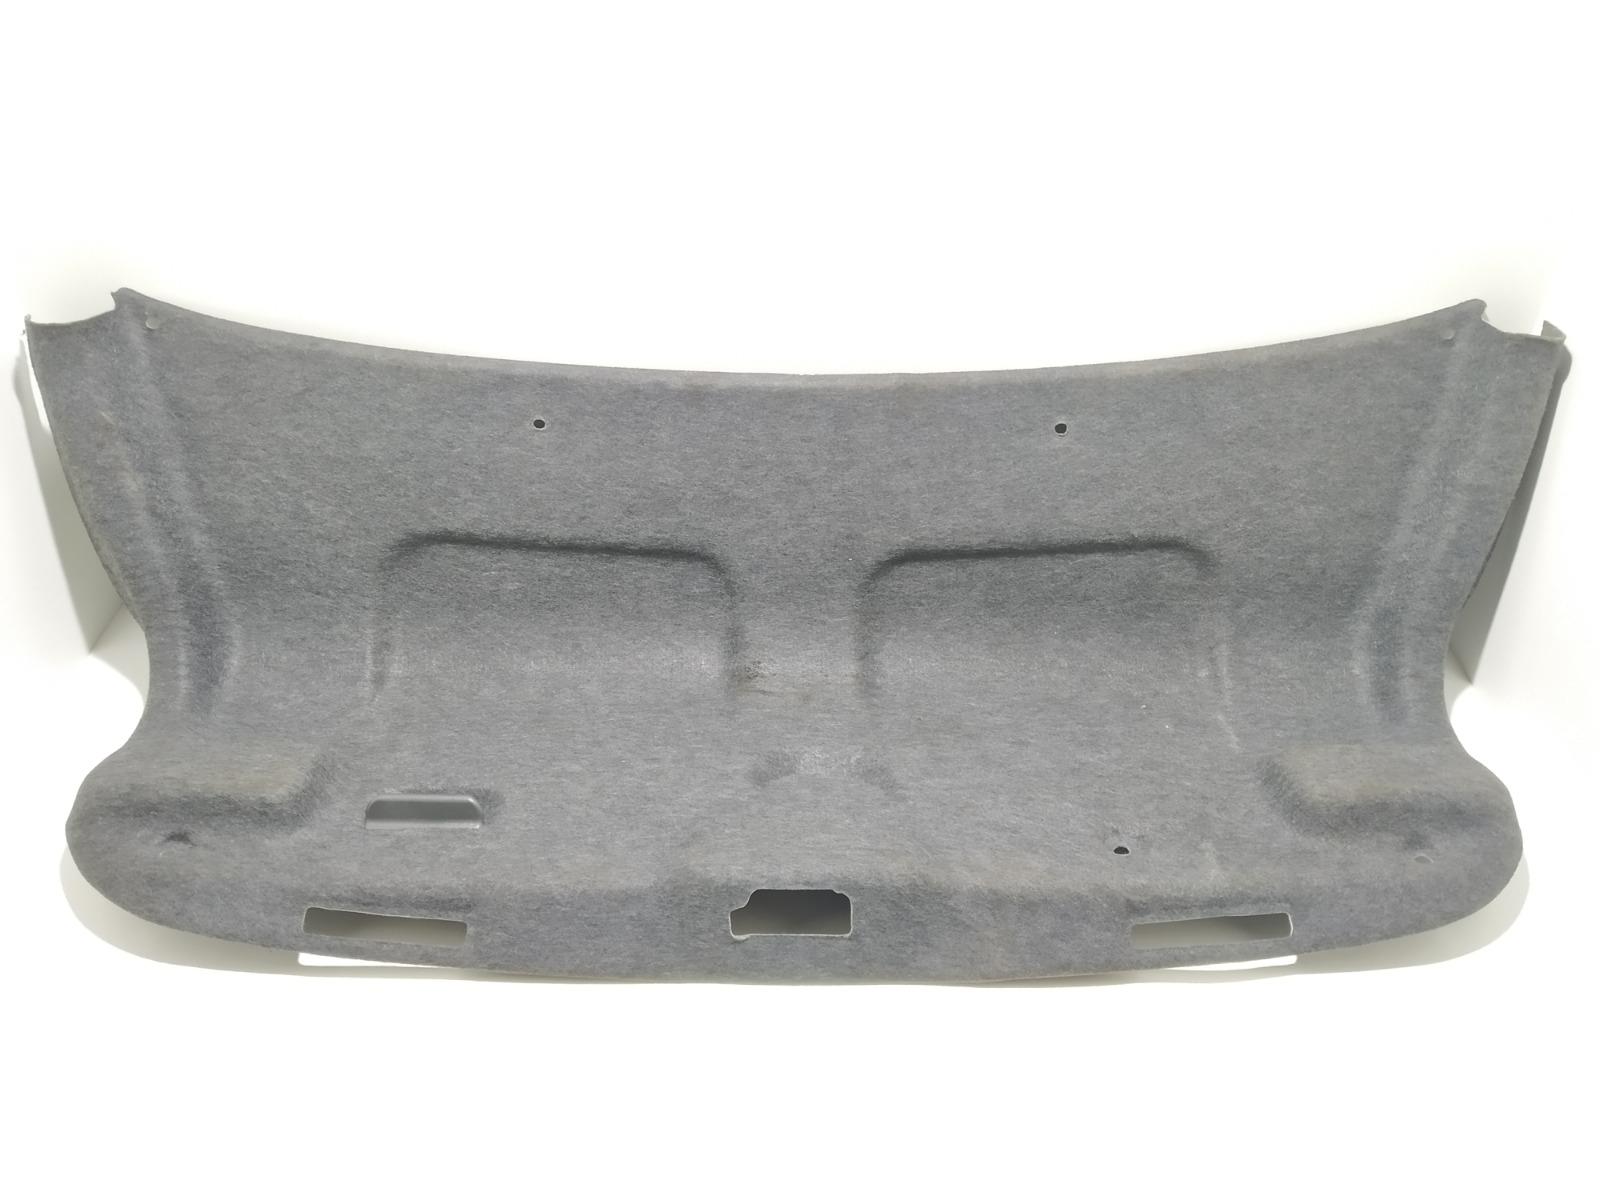 Обшивка крышки багажника Honda Accord 2.4 I 2003 (б/у)